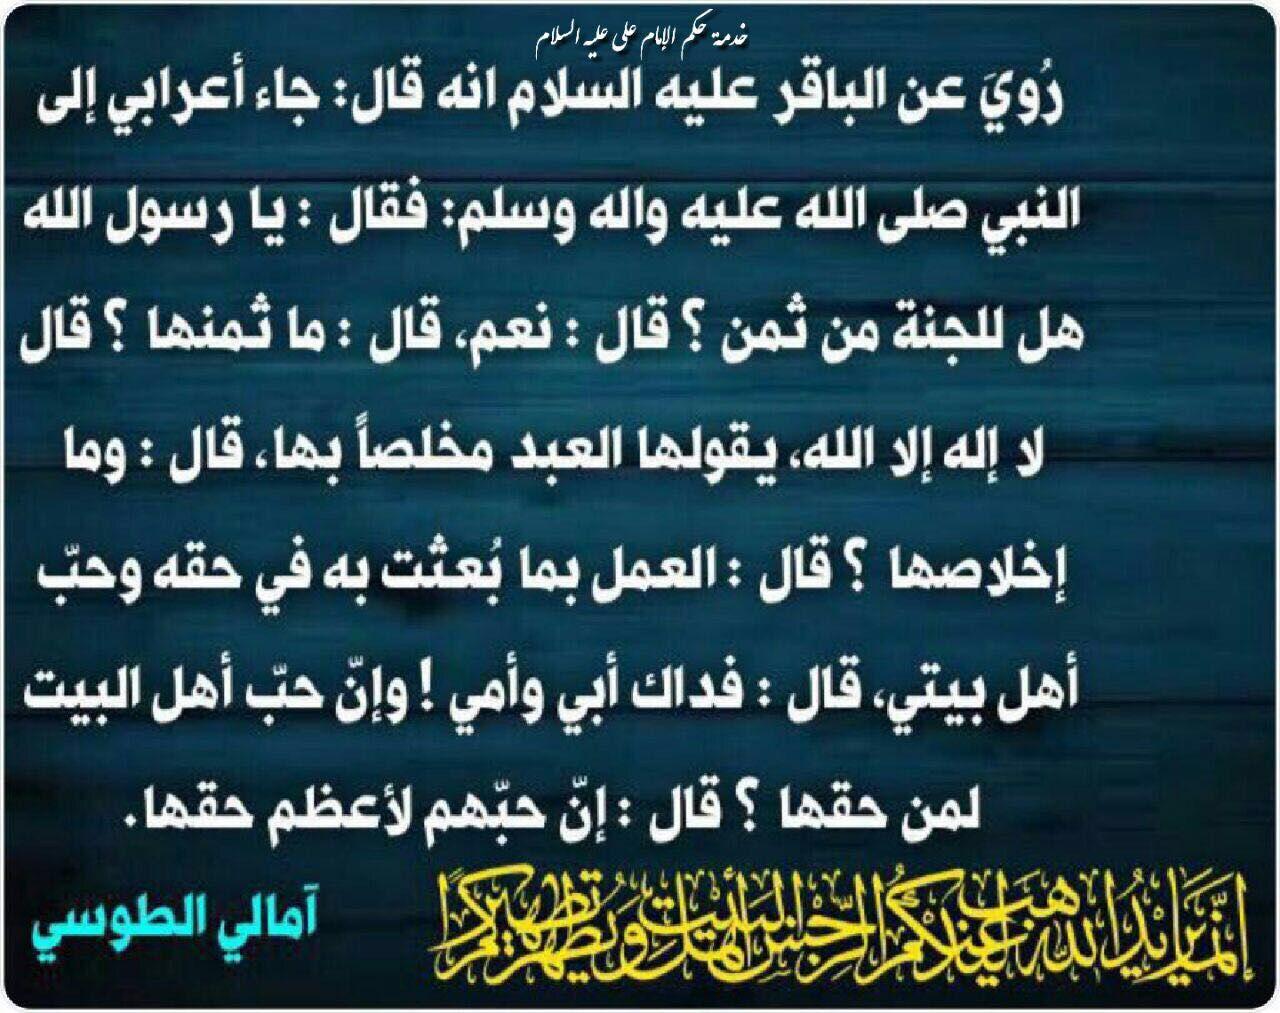 Pin By Abomohammad On أحاديث أهل البيت عليهم الصلاة والسلام Weather